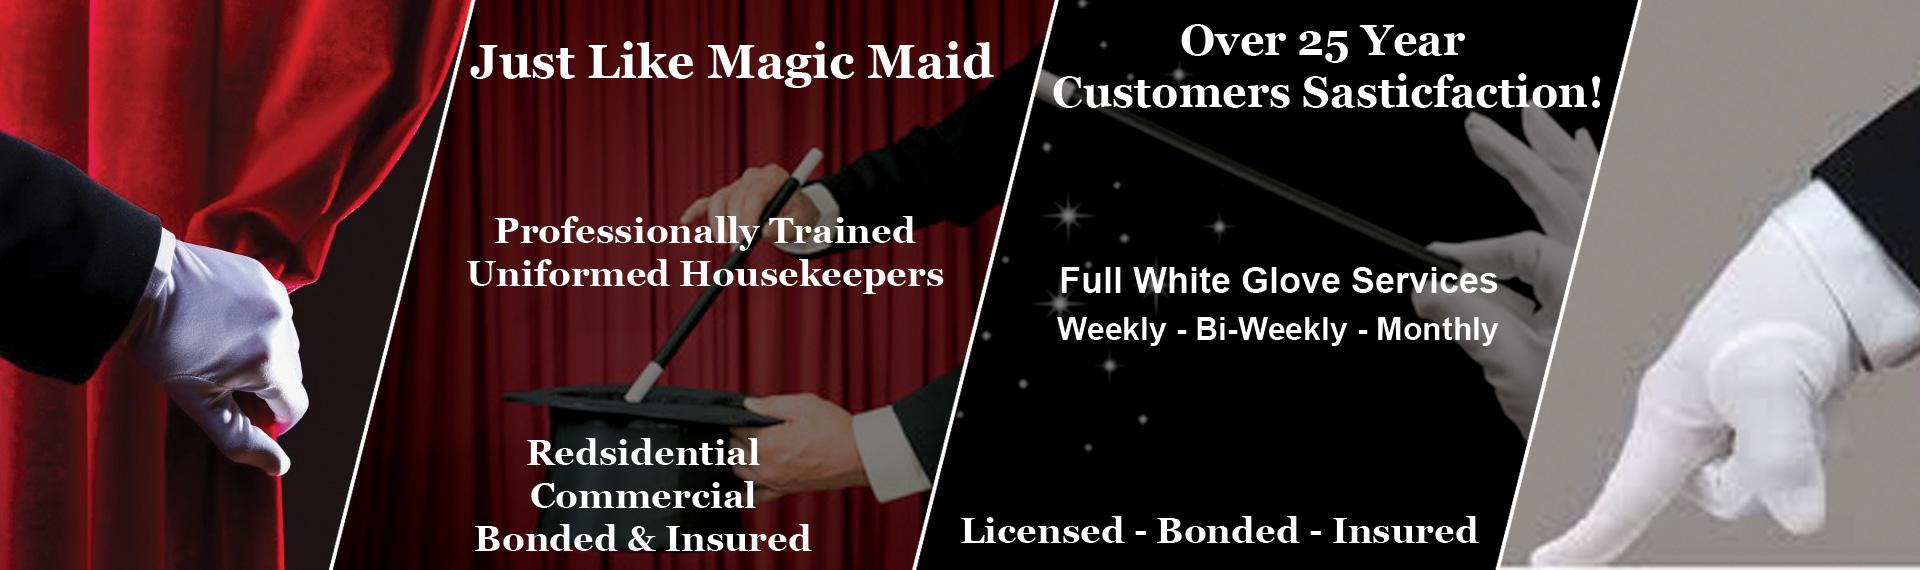 Just Like Magic Maids Beverly Hills CA